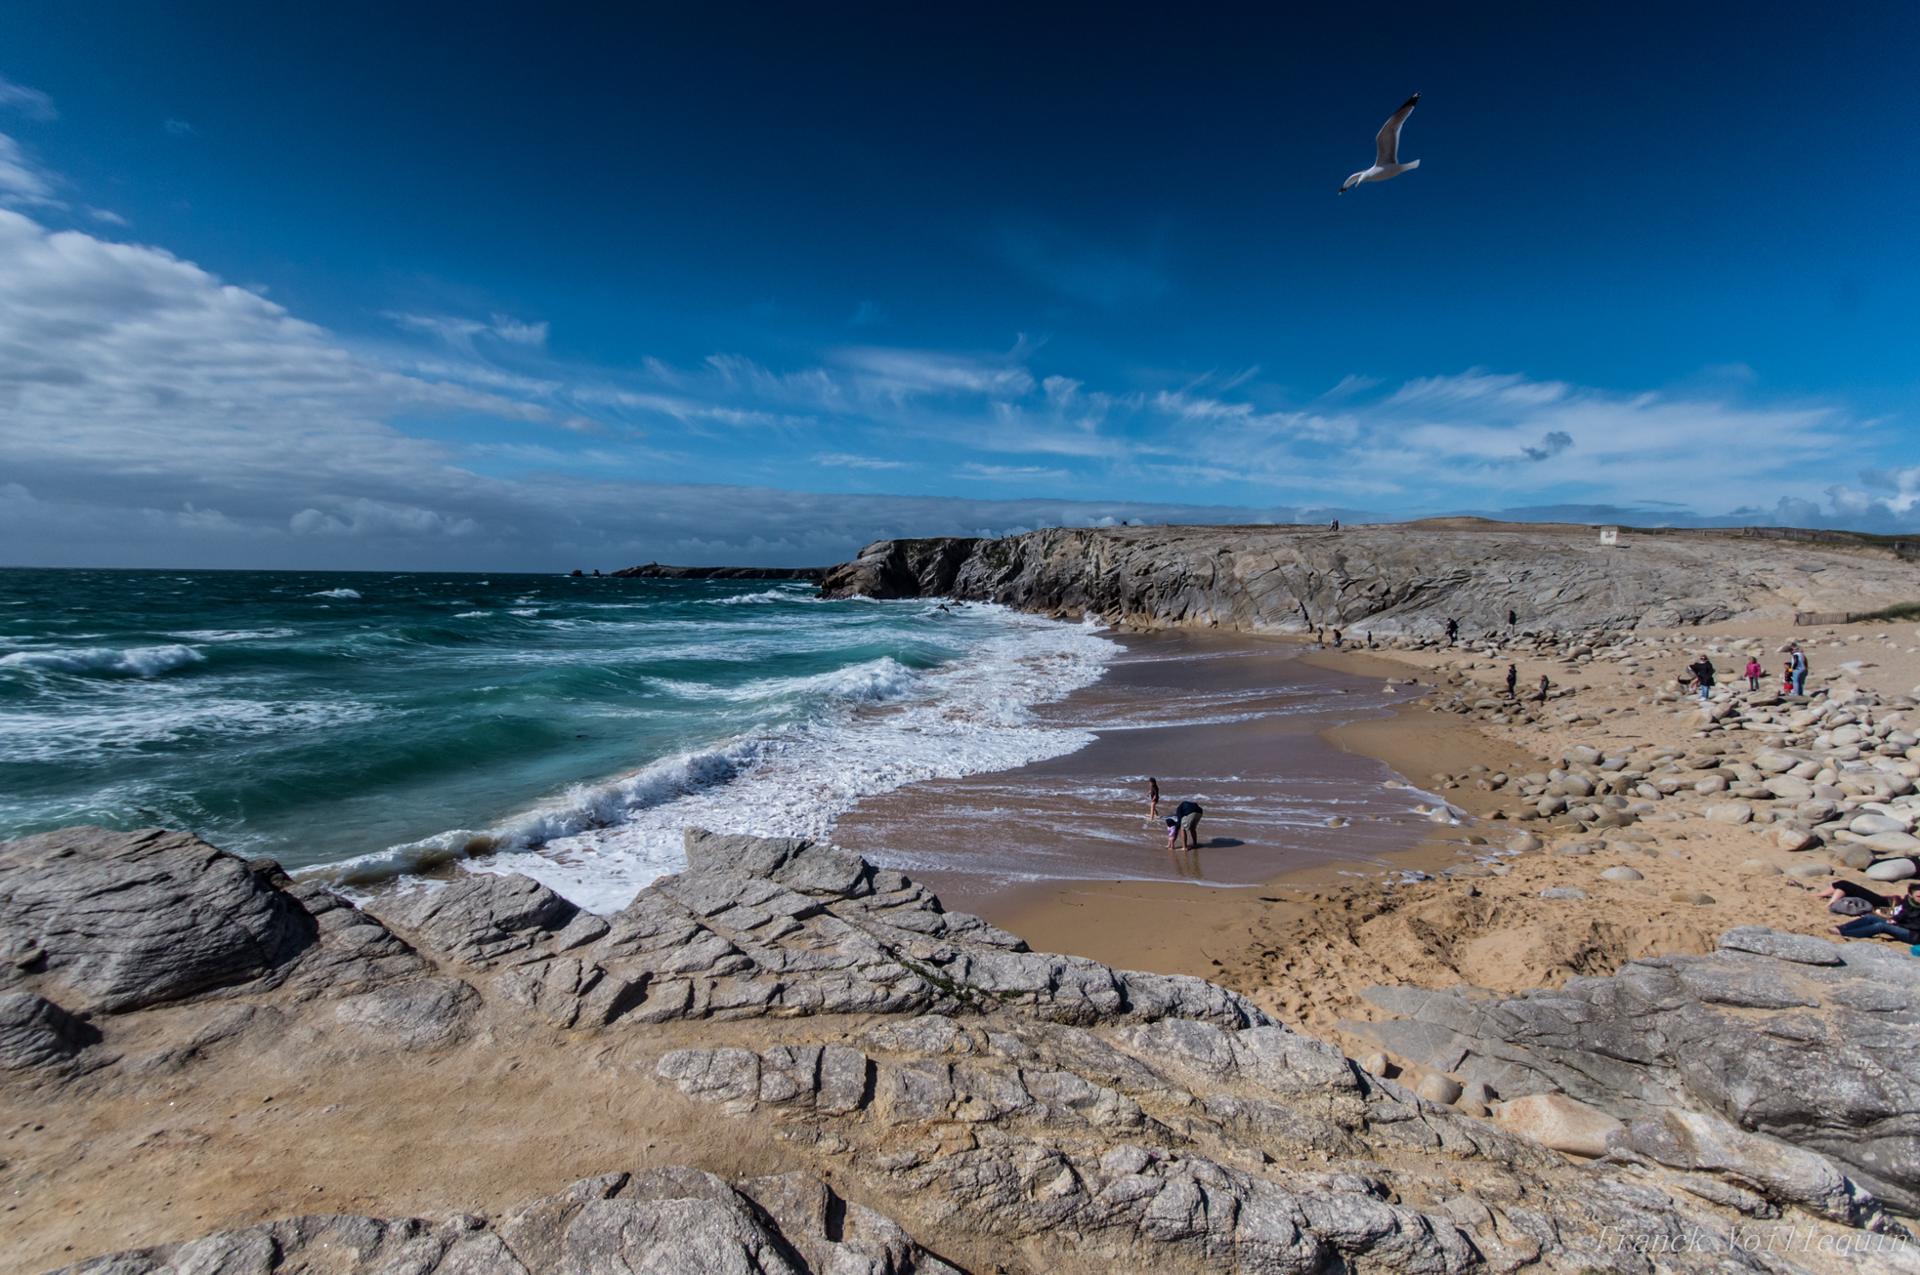 Côte sauvage - Presqu'île de Quiberon